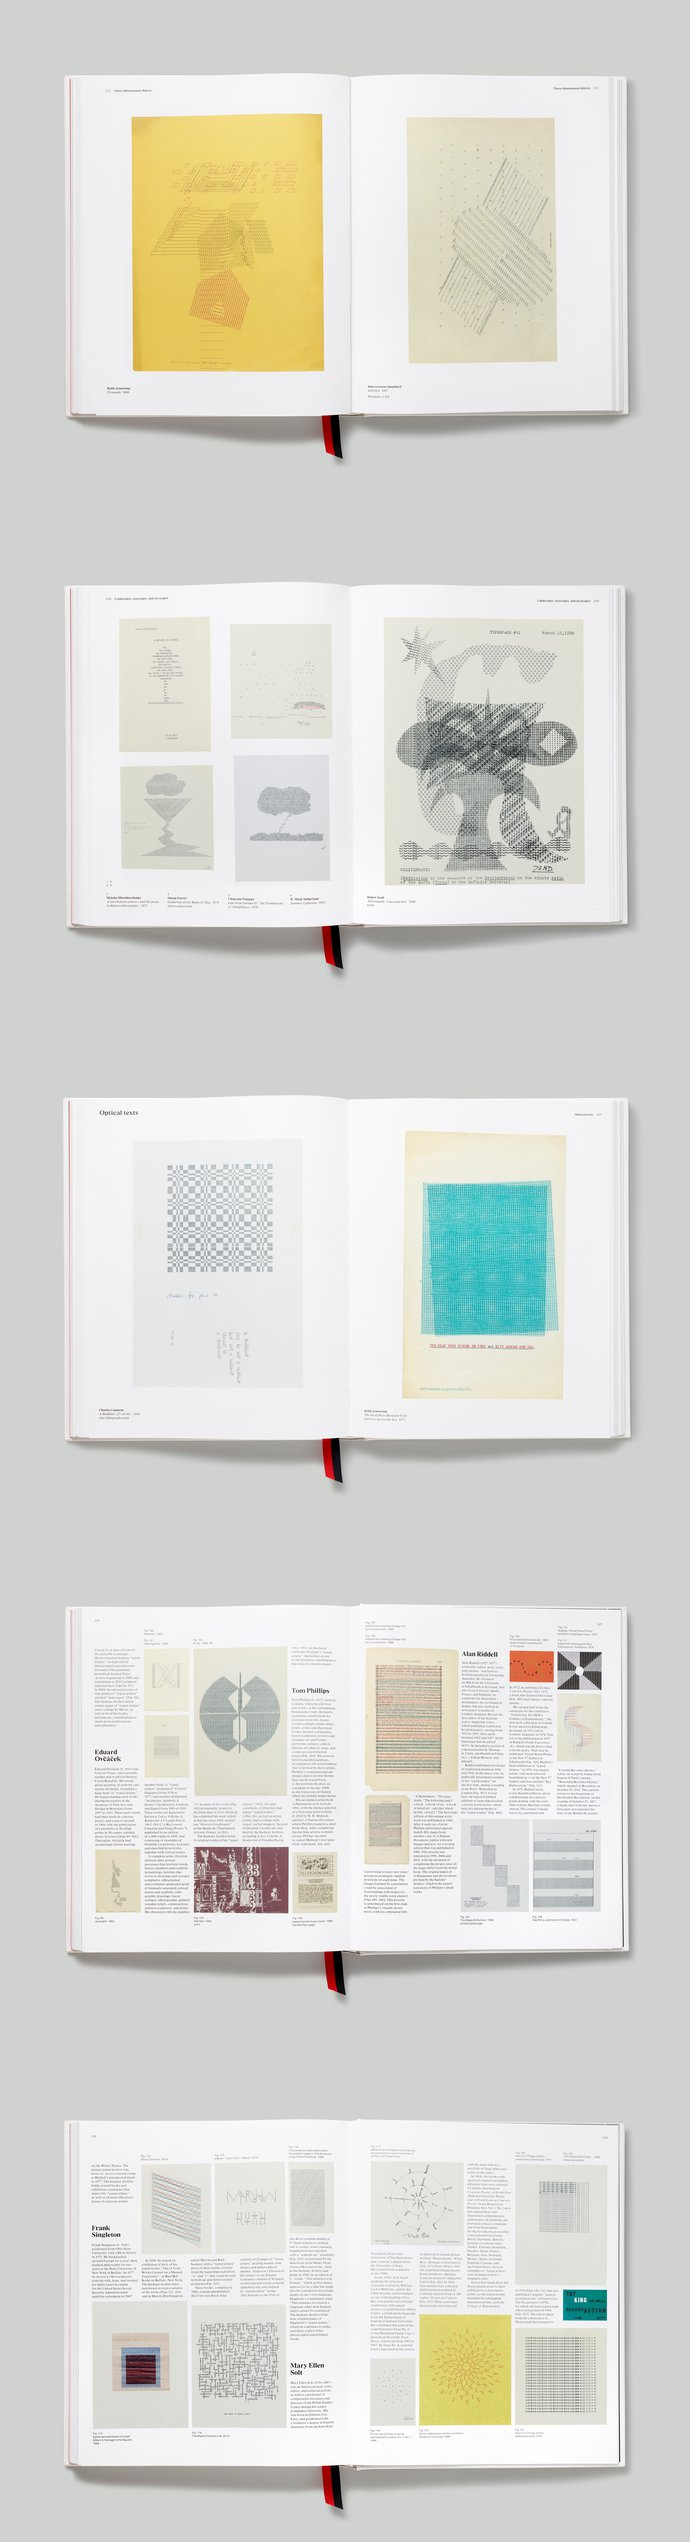 Thames & Hudson – The art of typewriting, 2015 (Publication), image 3